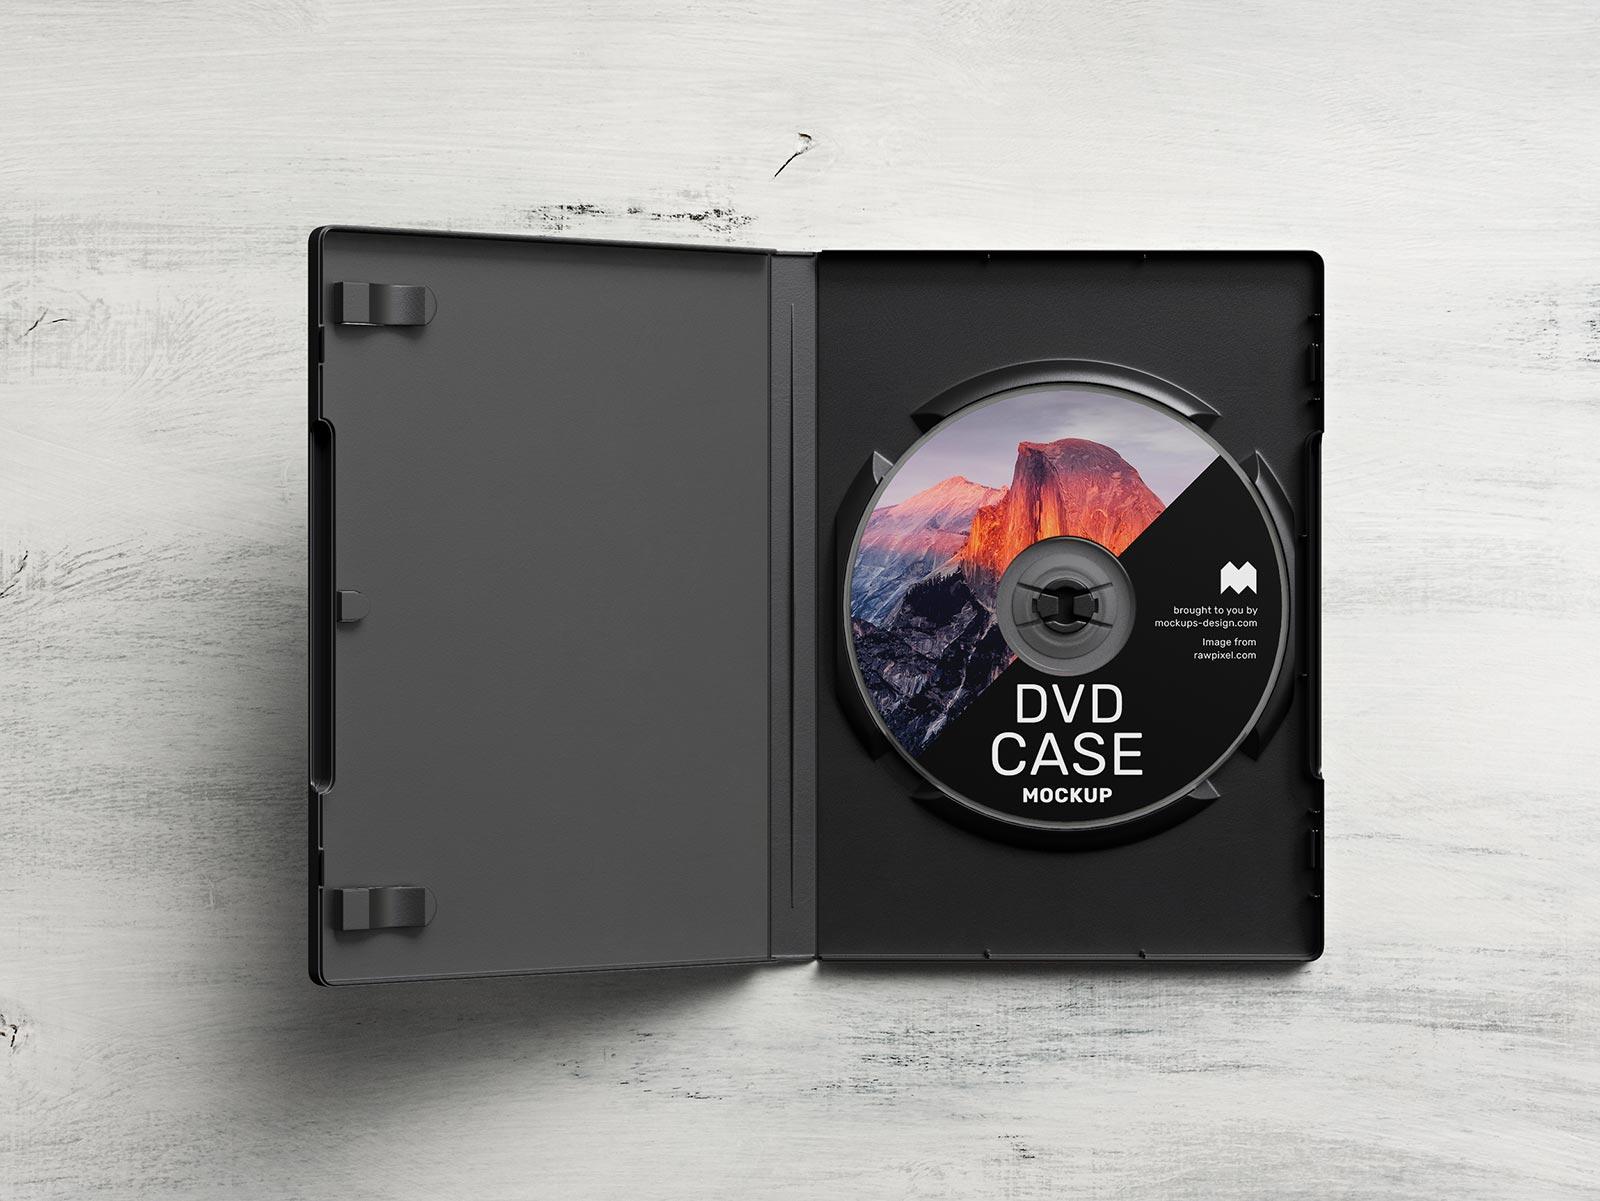 Free-DVD-Box-Disc-Case-Mockup-PSD-Set-(7)